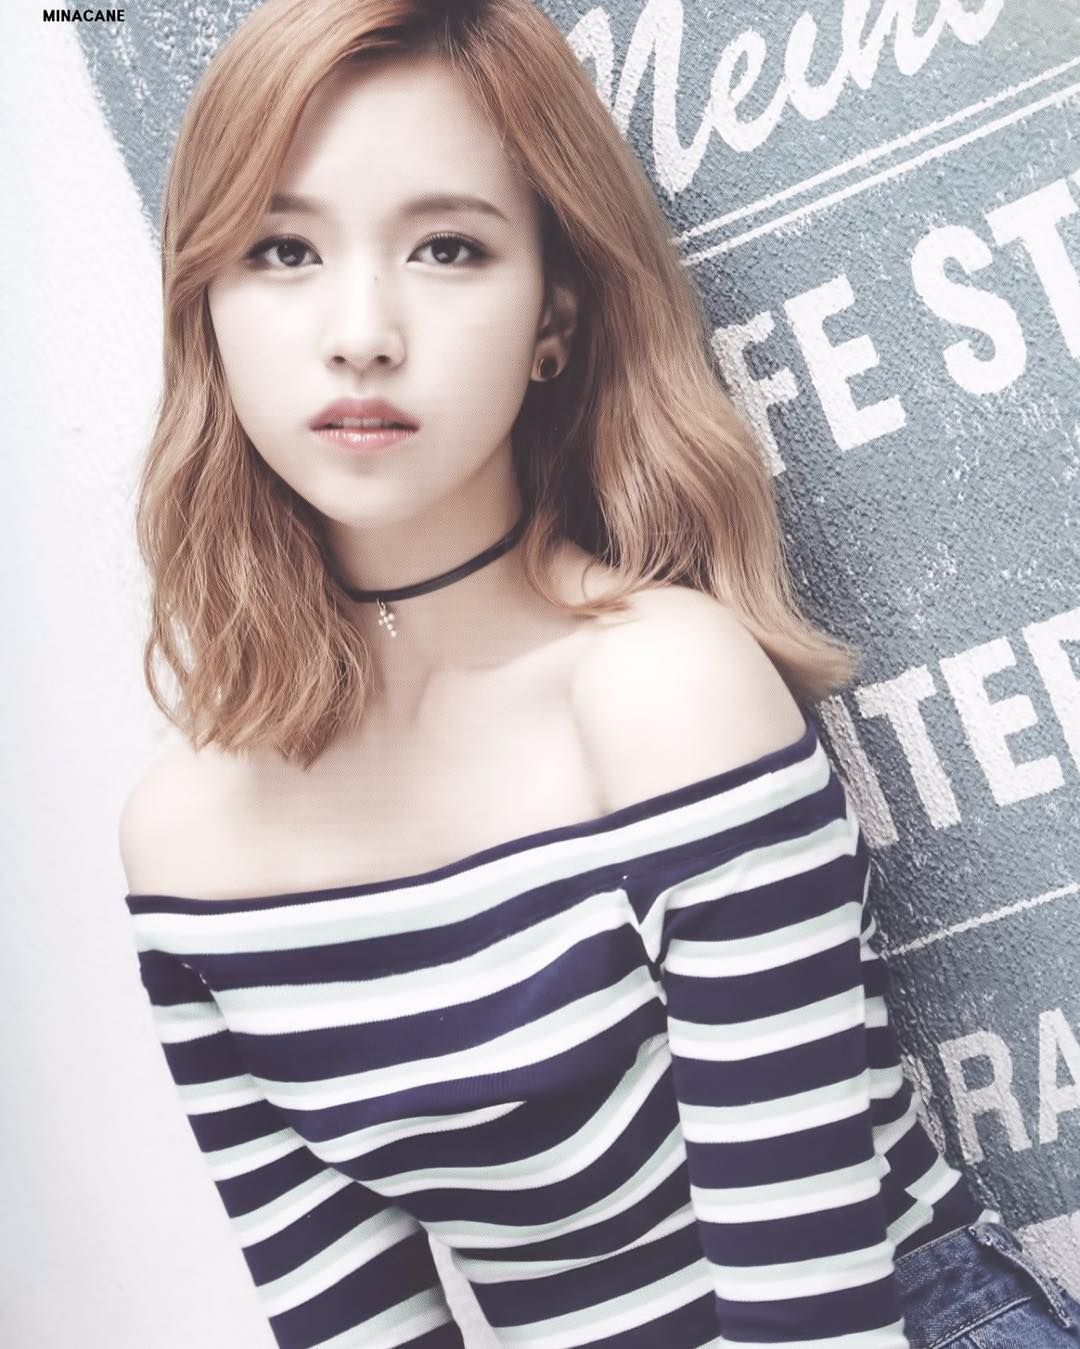 twice-mina | think about it twice | pinterest | k pop, girl group